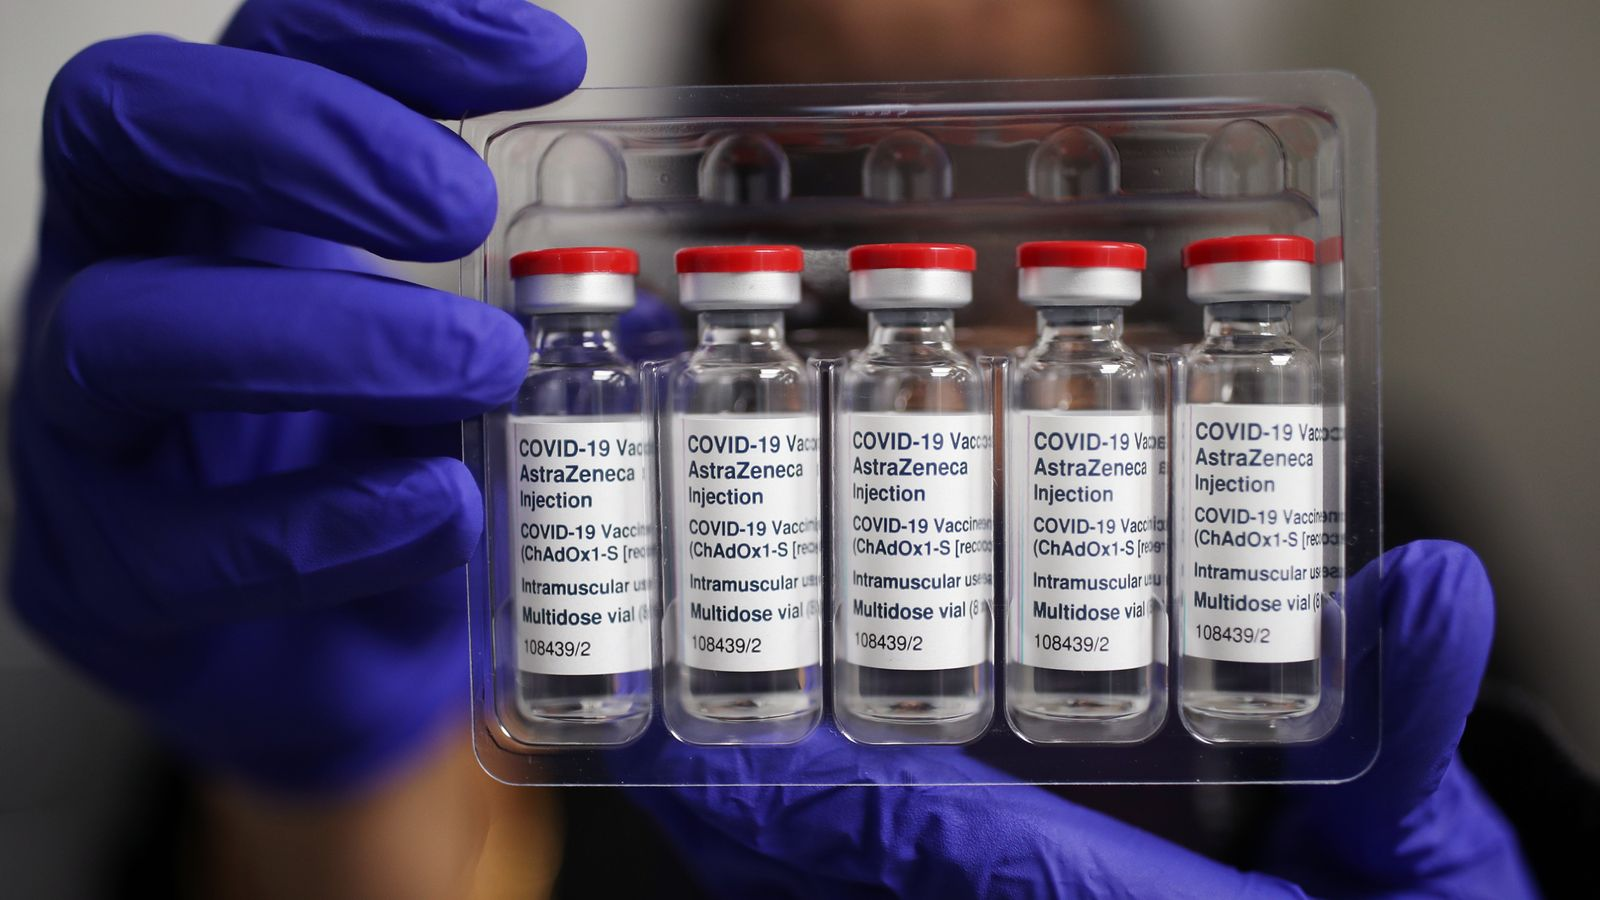 COVID-19: UK to give Kenya more than 800,000 doses of Oxford-AstraZeneca coronavirus vaccine